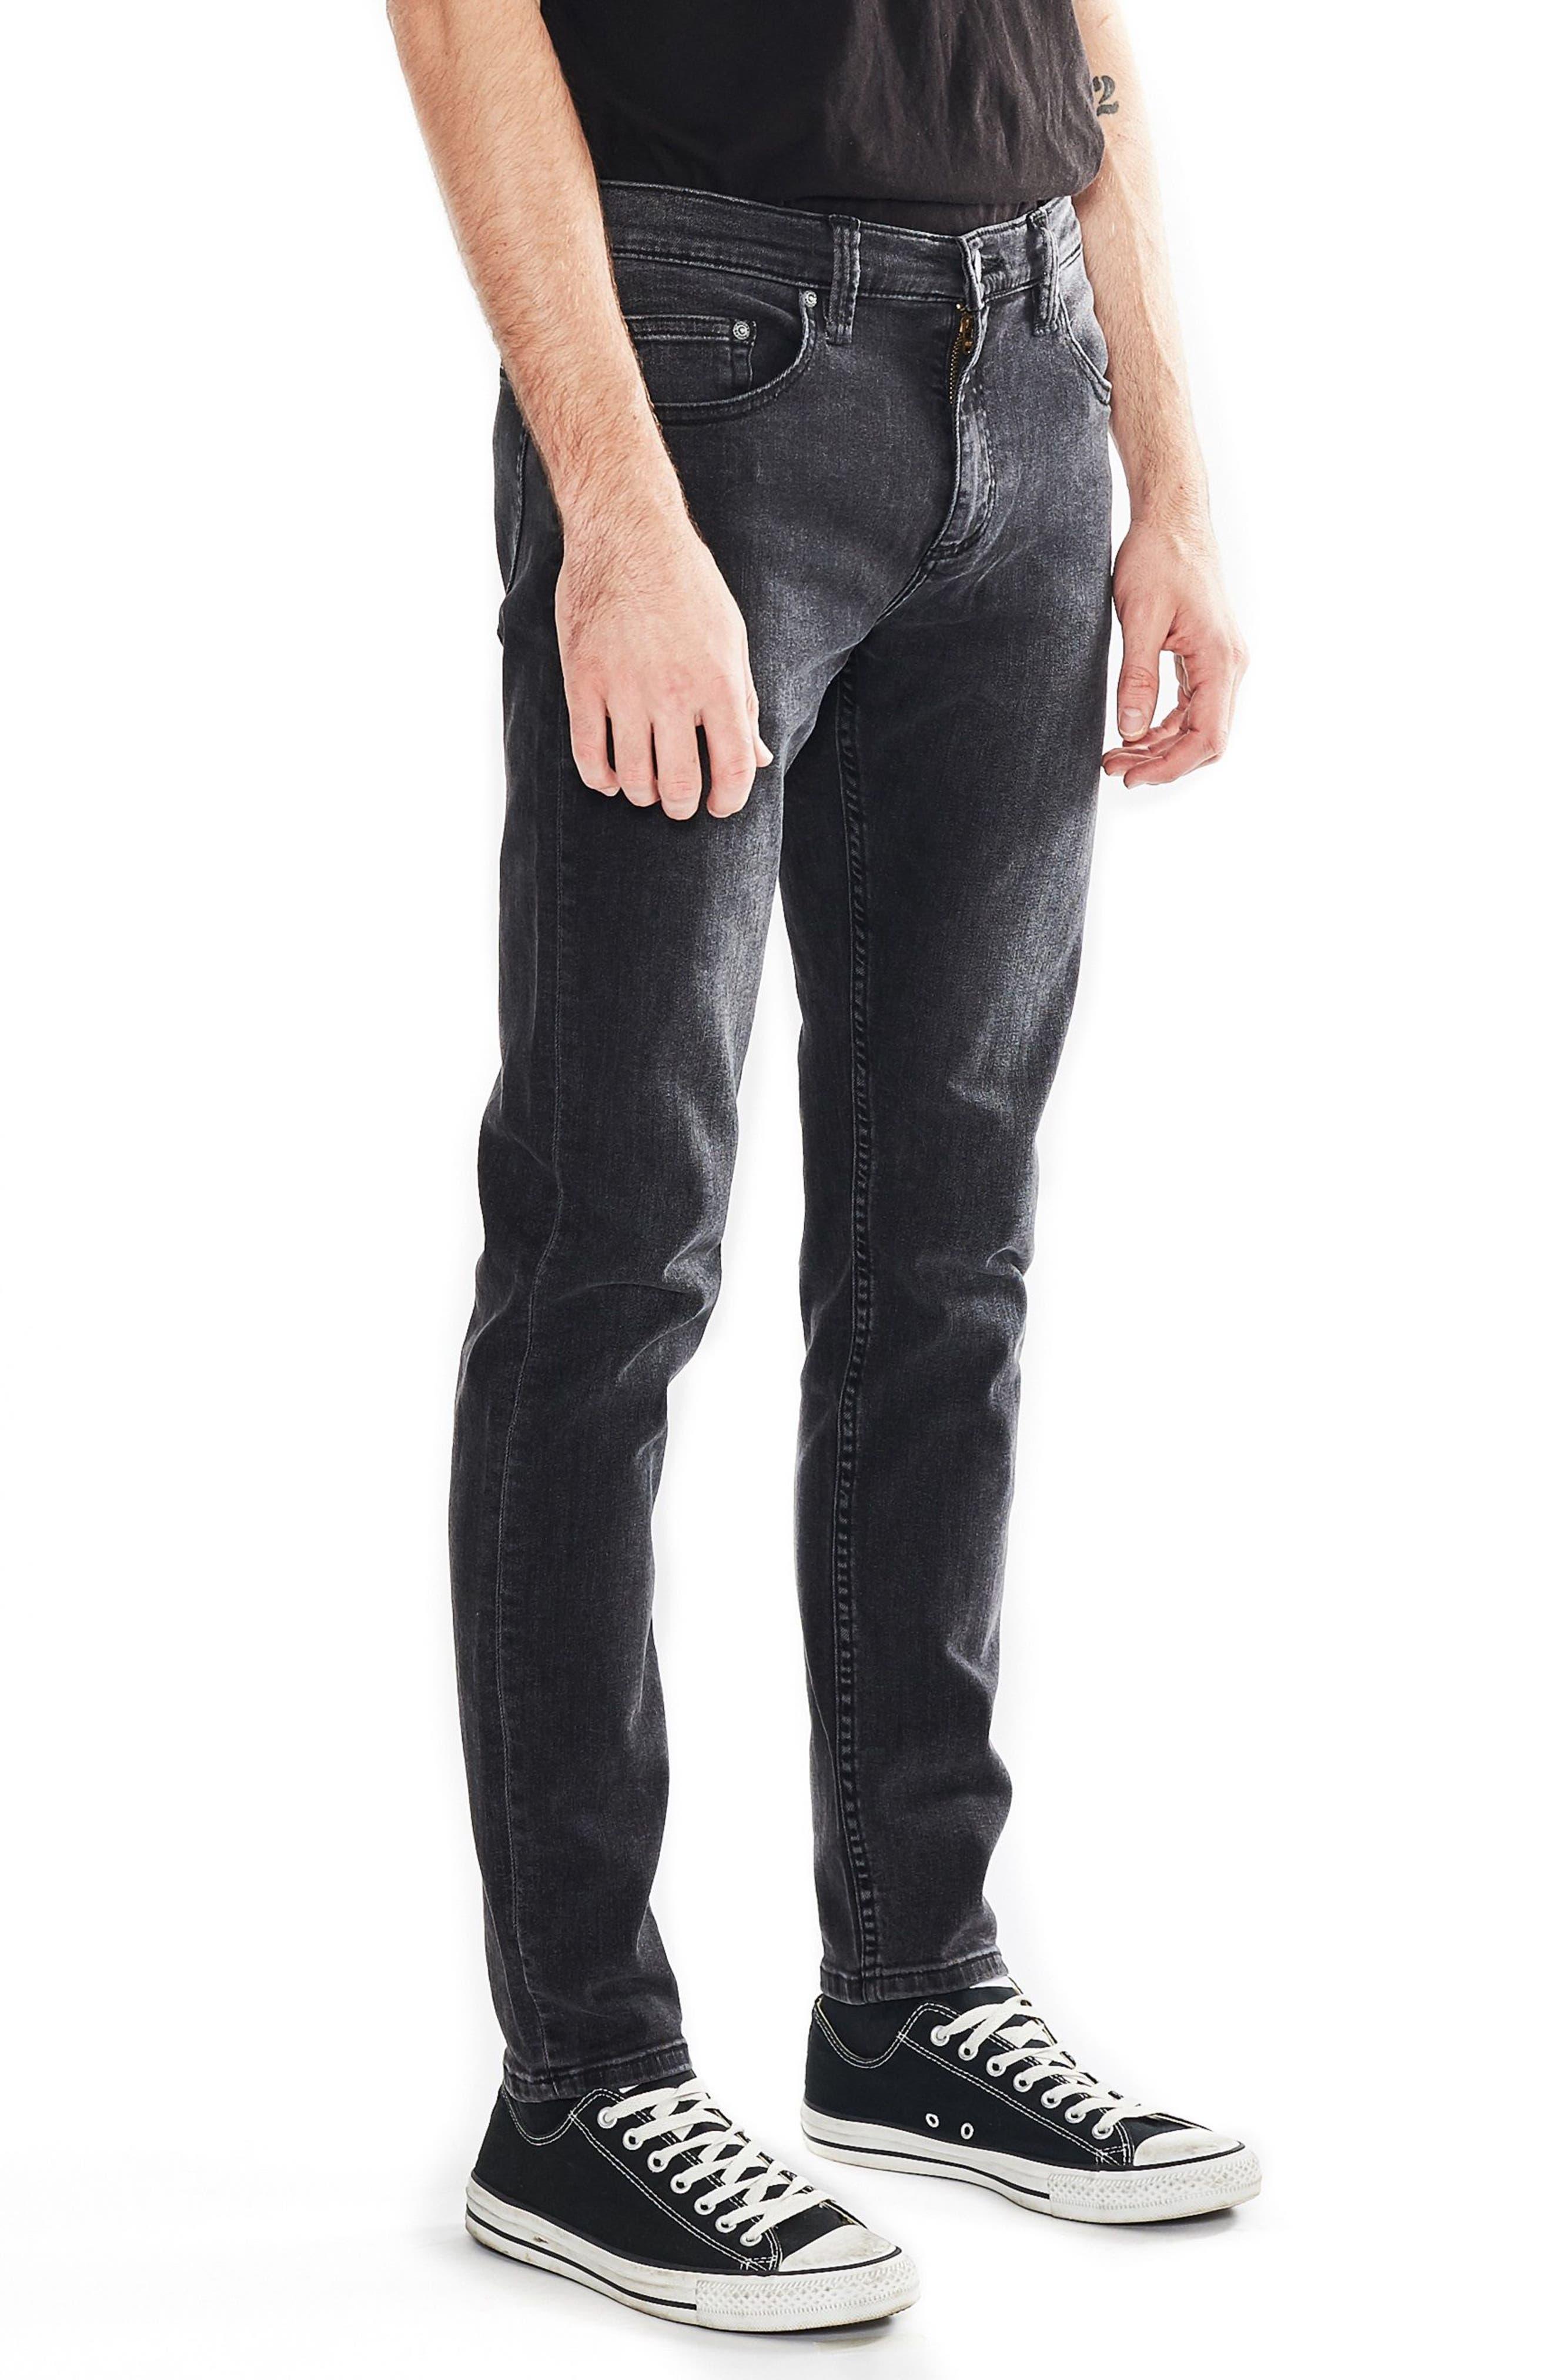 Stinger Skinny Fit Jeans,                             Alternate thumbnail 3, color,                             Old Gold